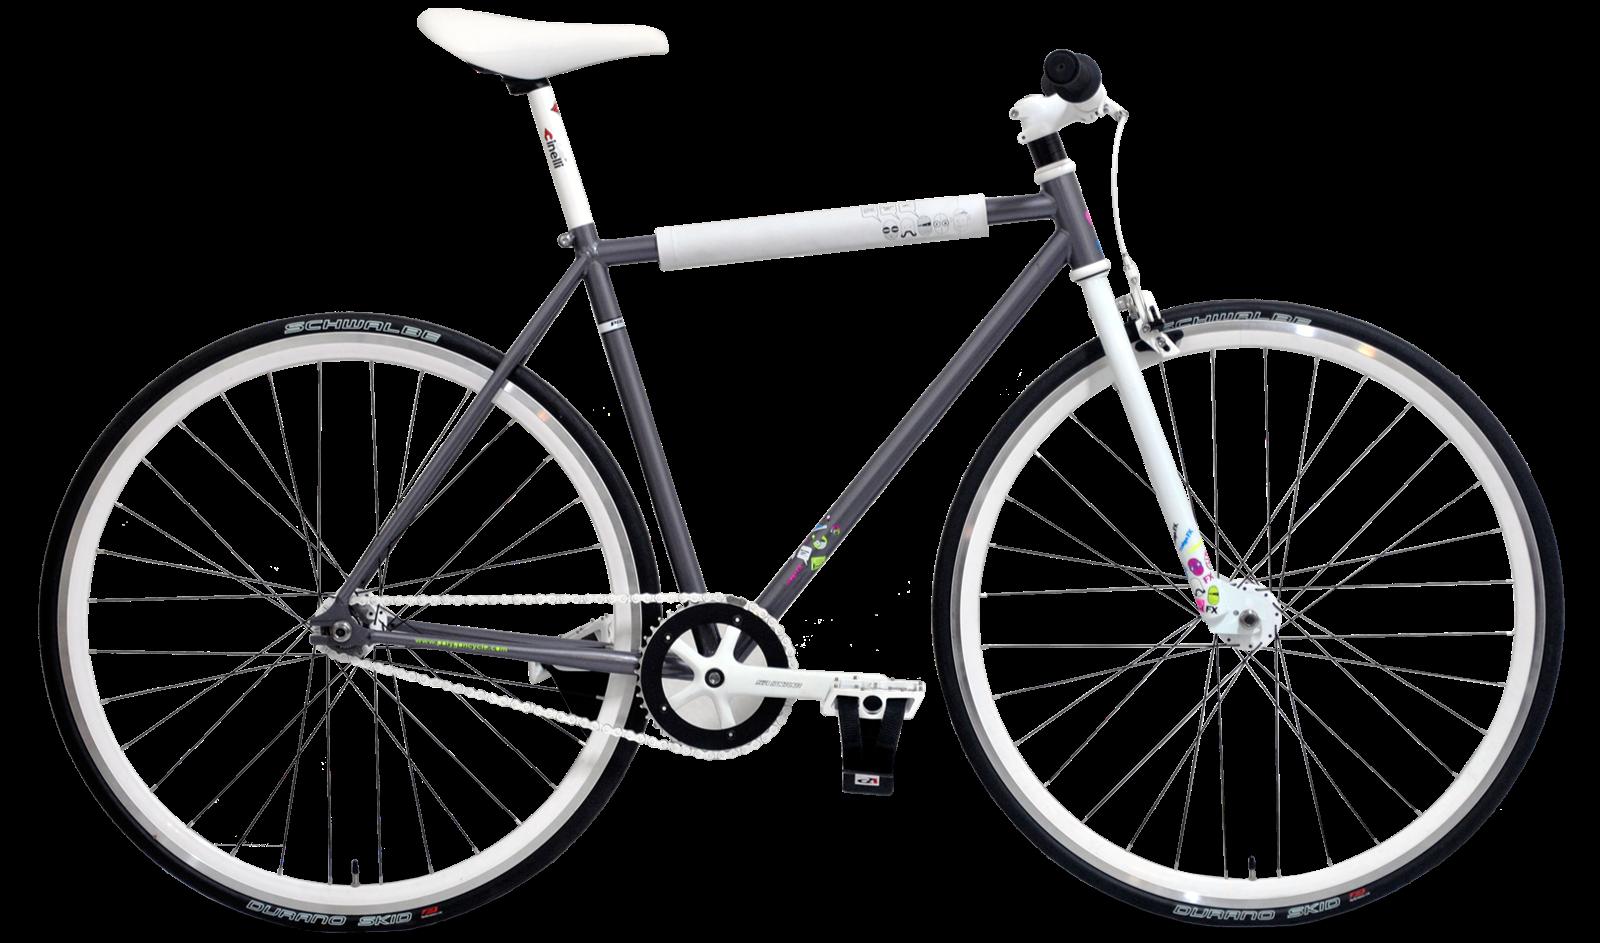 FIA BIKE: Sepeda Balap Polygon RUDGE FX (Series 2013)